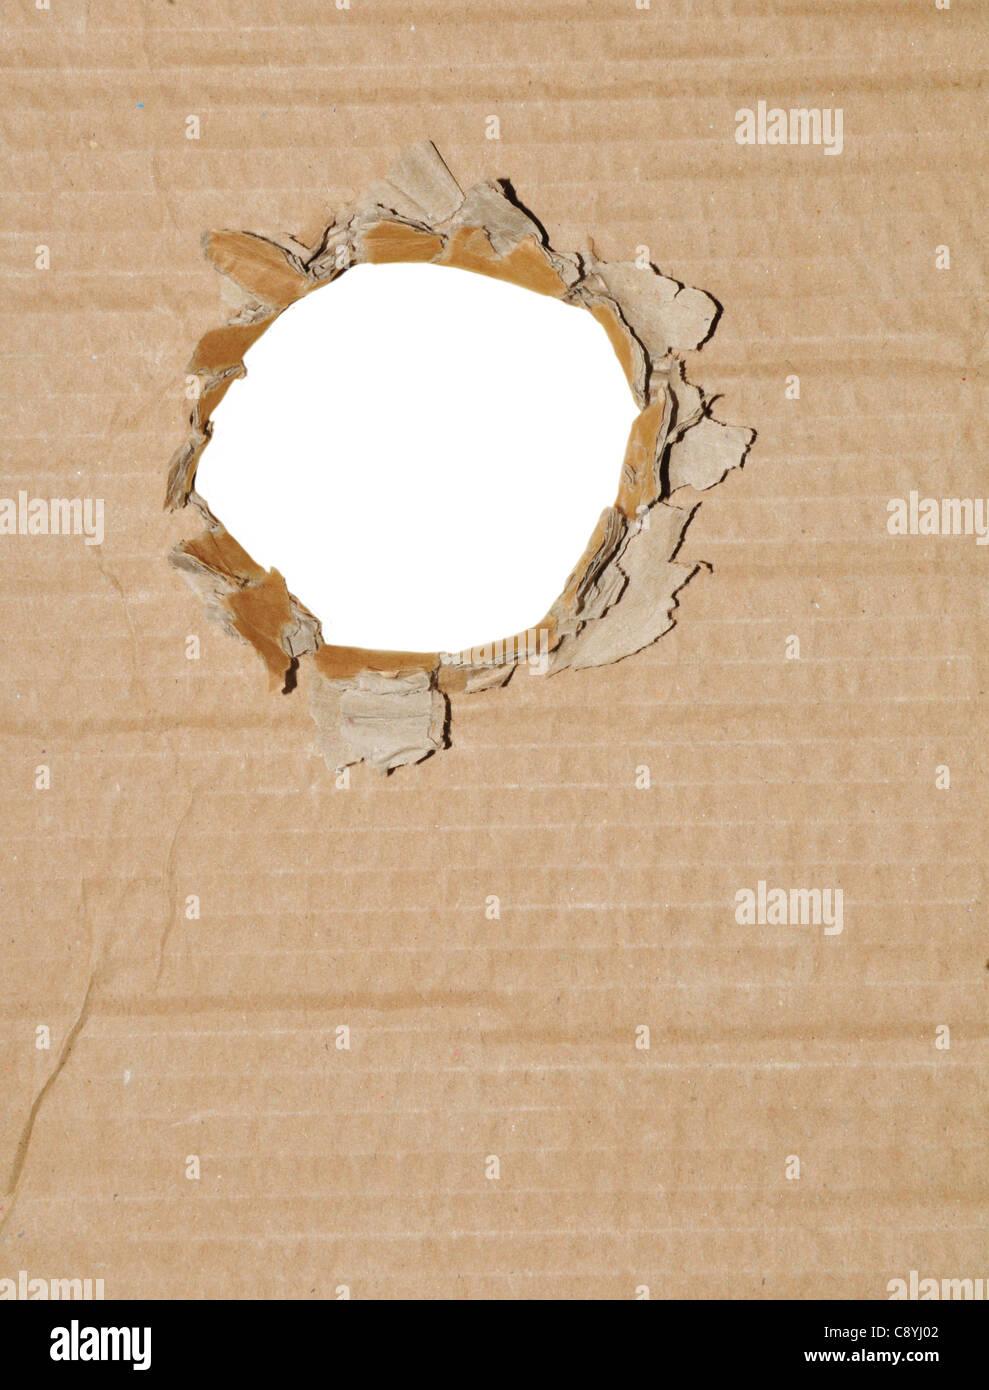 Cardboard hole - Stock Image